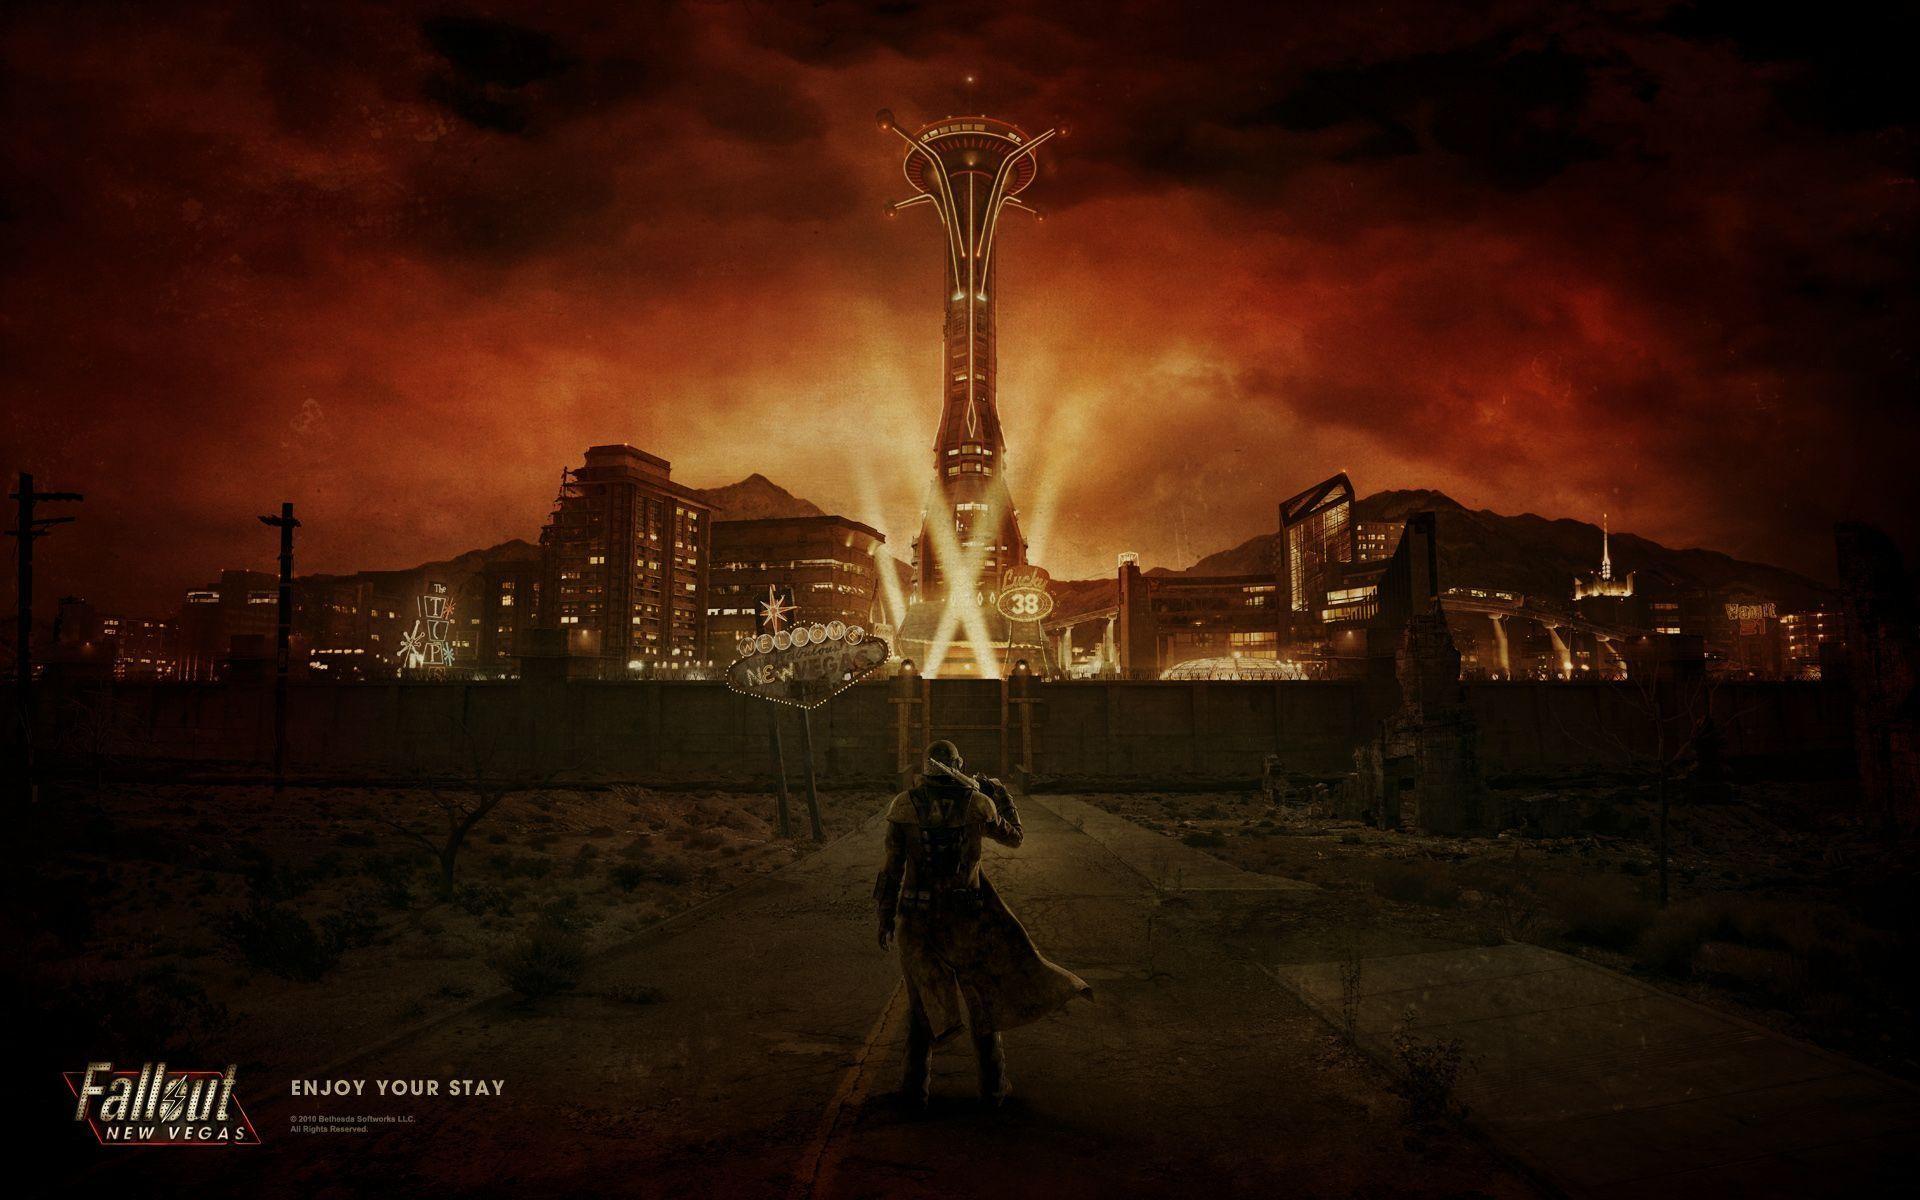 Fallout-New-Vegas-1080p-Cave-wallpaper-wp4006223